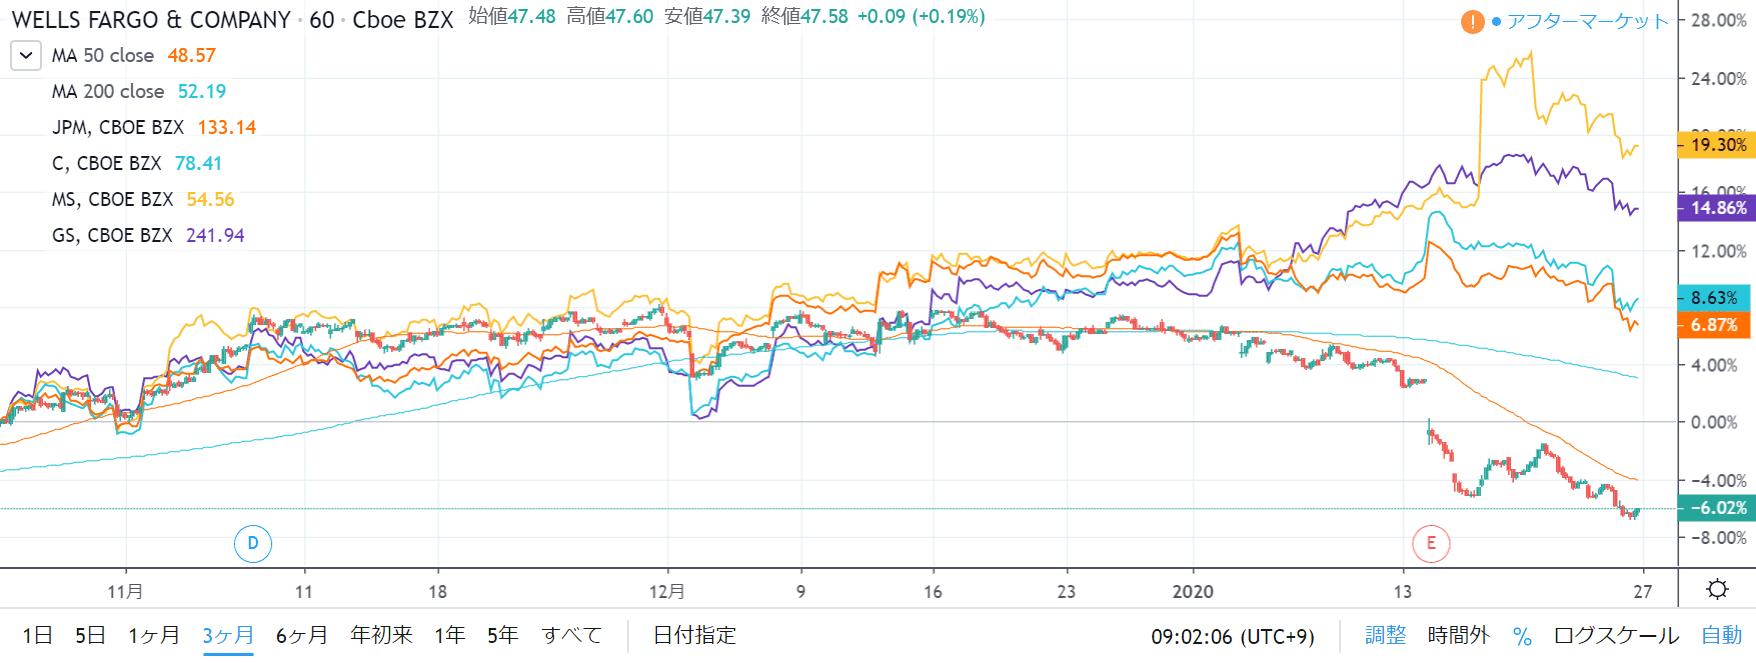 WFC株価チャート